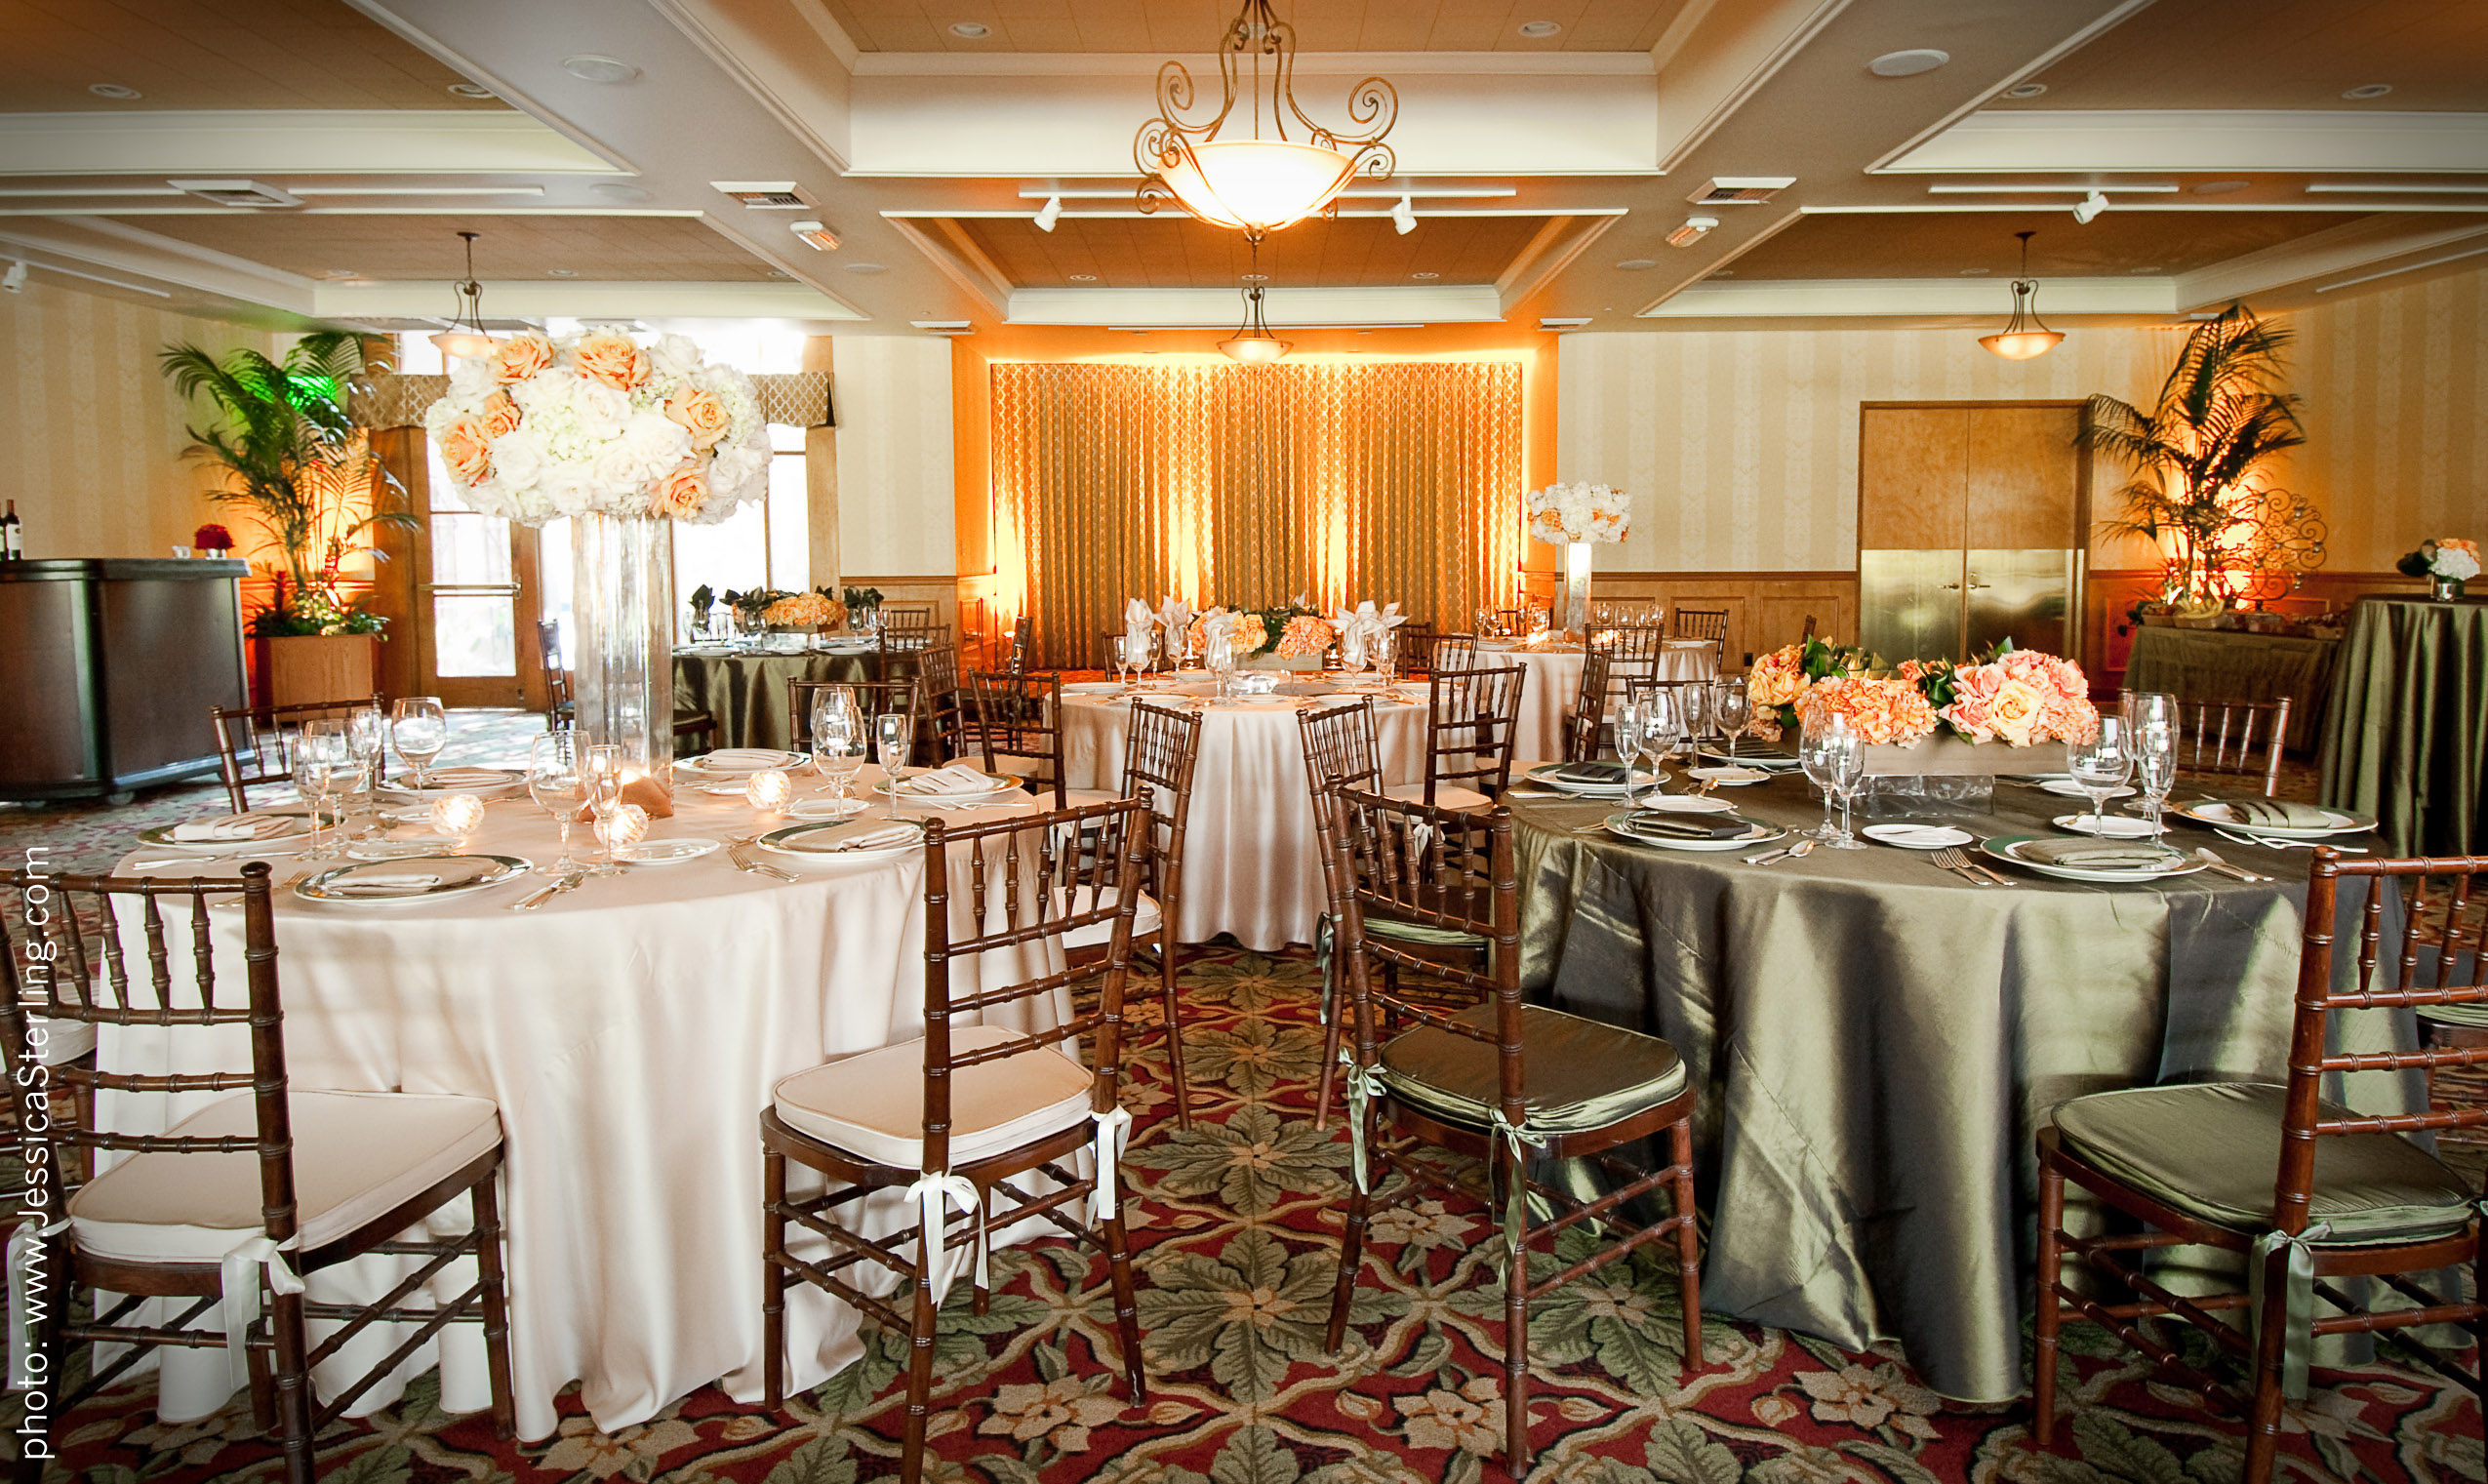 Oakmont Country Club Celebrates Its Banquet Room Renovation